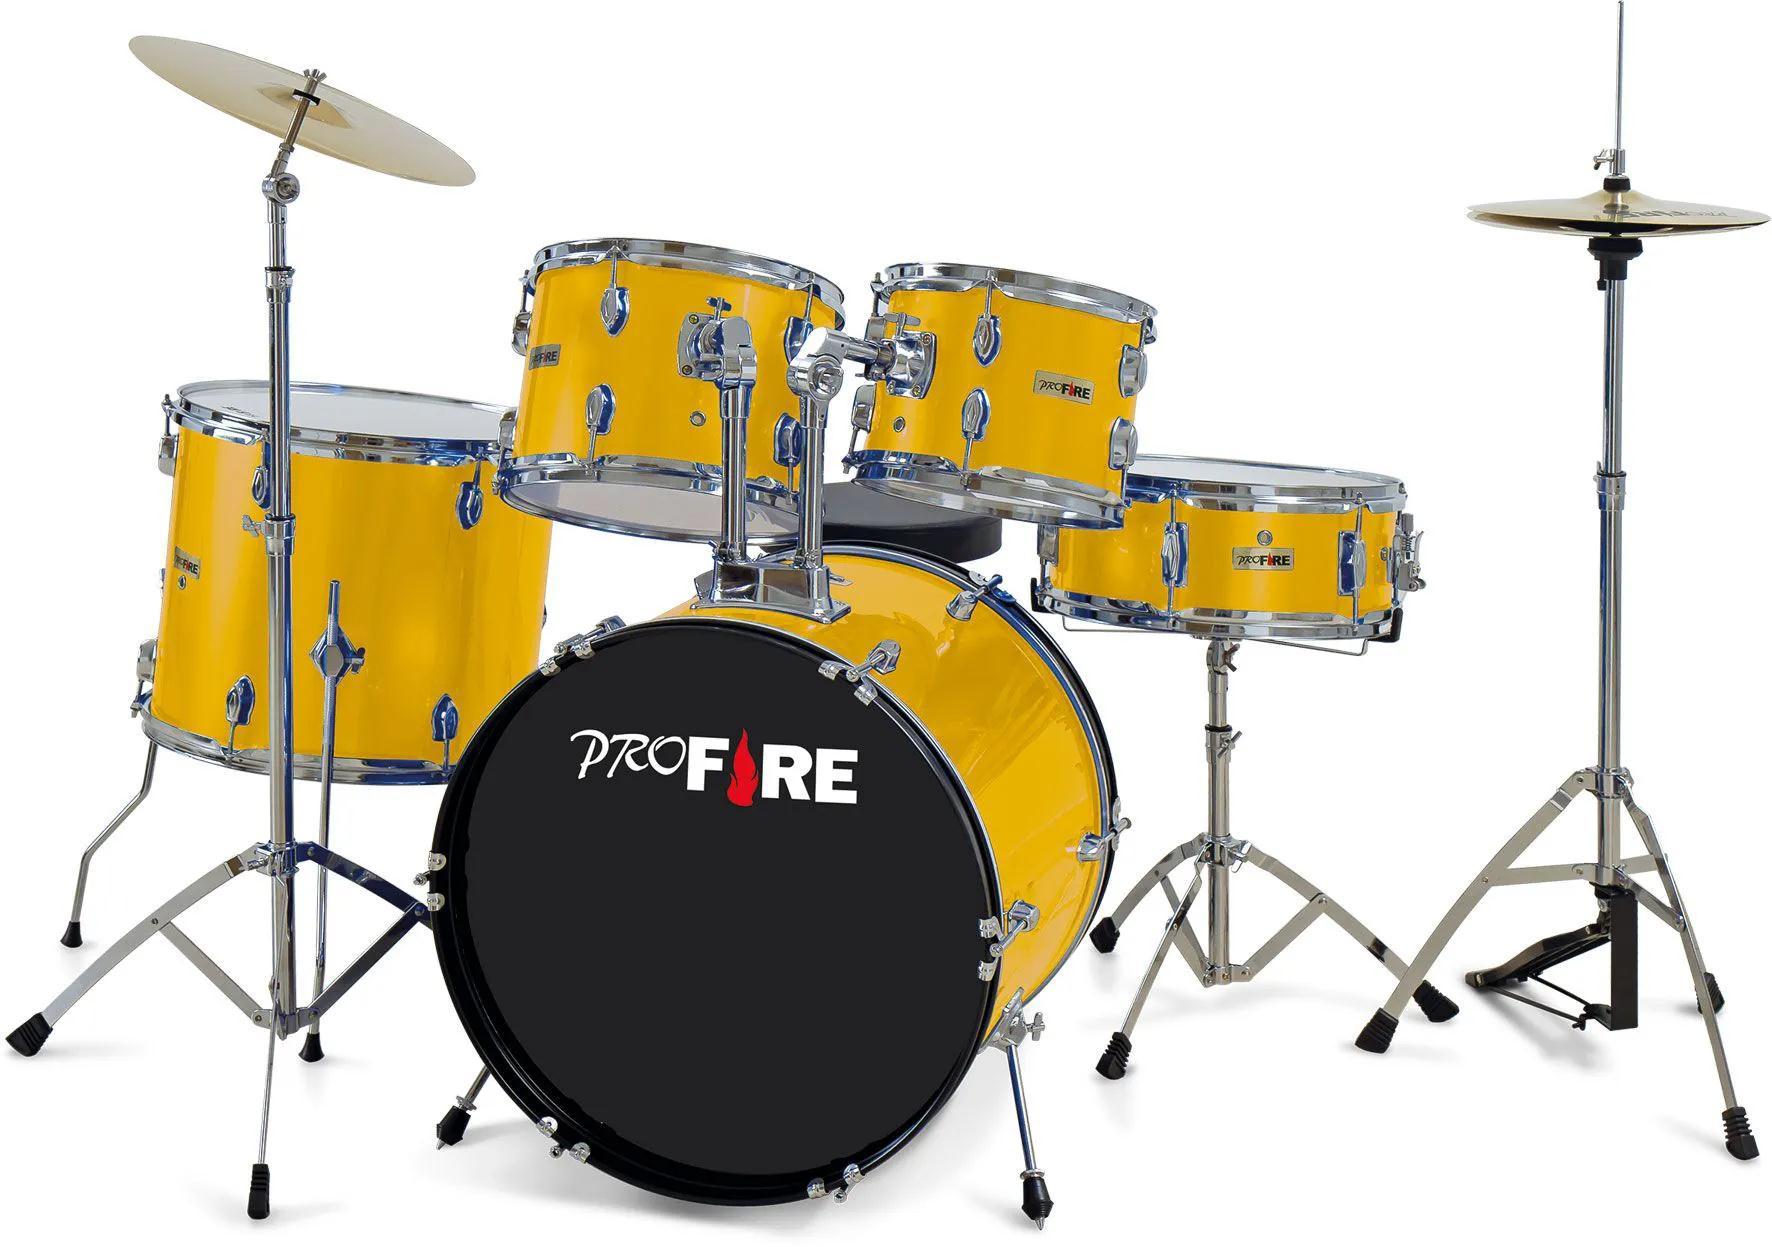 Pro Fire Bateria Acústica Amarela (Bumbo 20''/Completa)